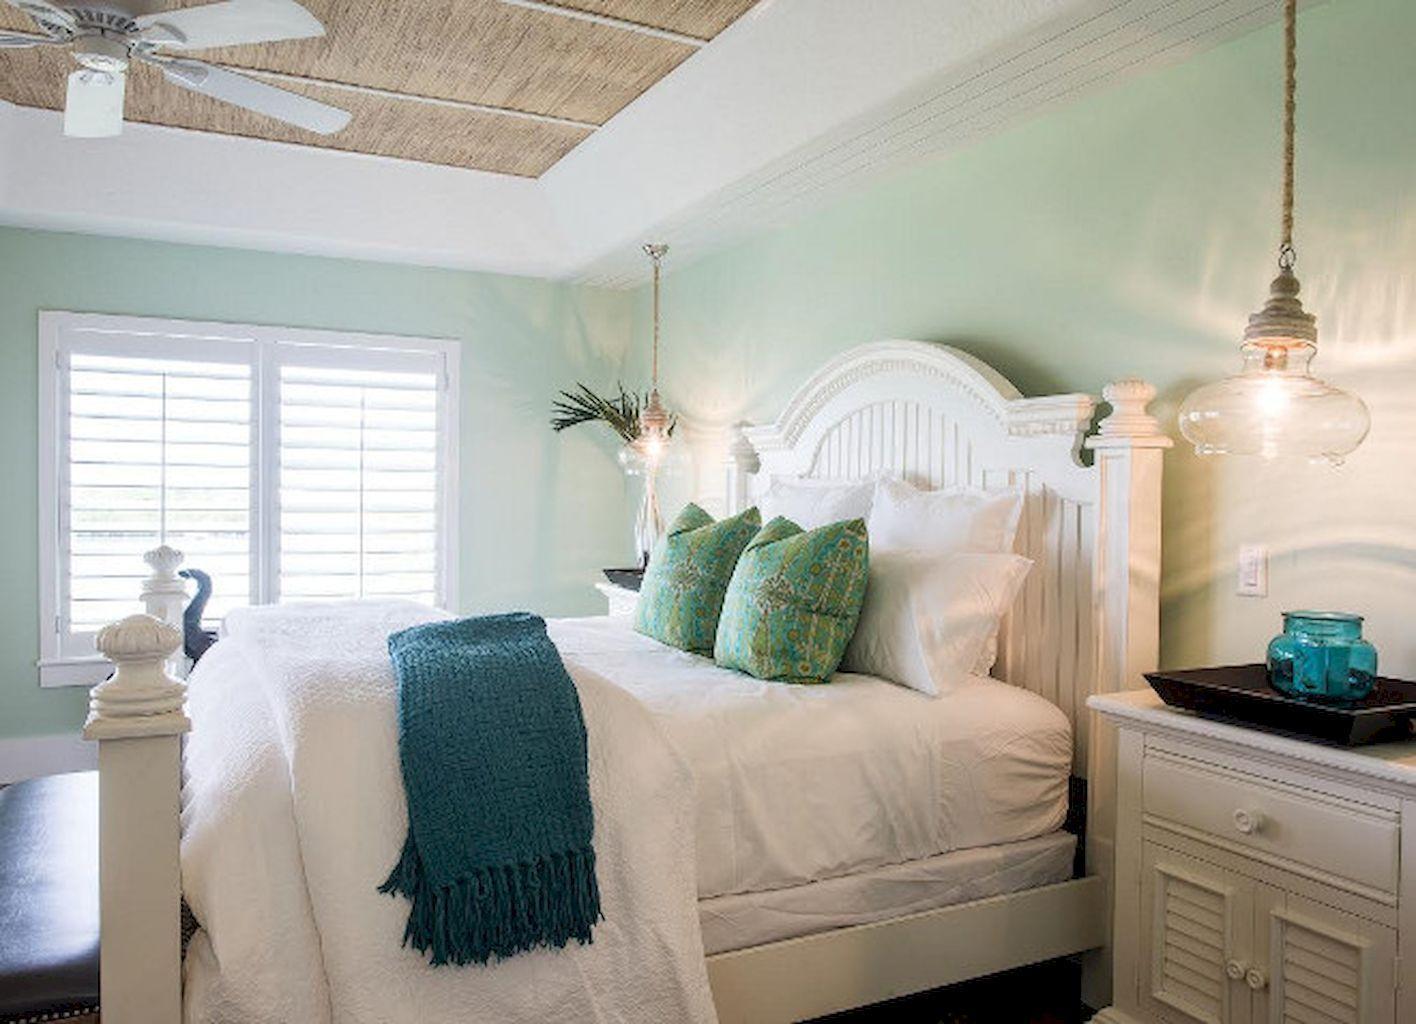 Adorable 70 Modern Coastal Bedroom Decorating Ideas https